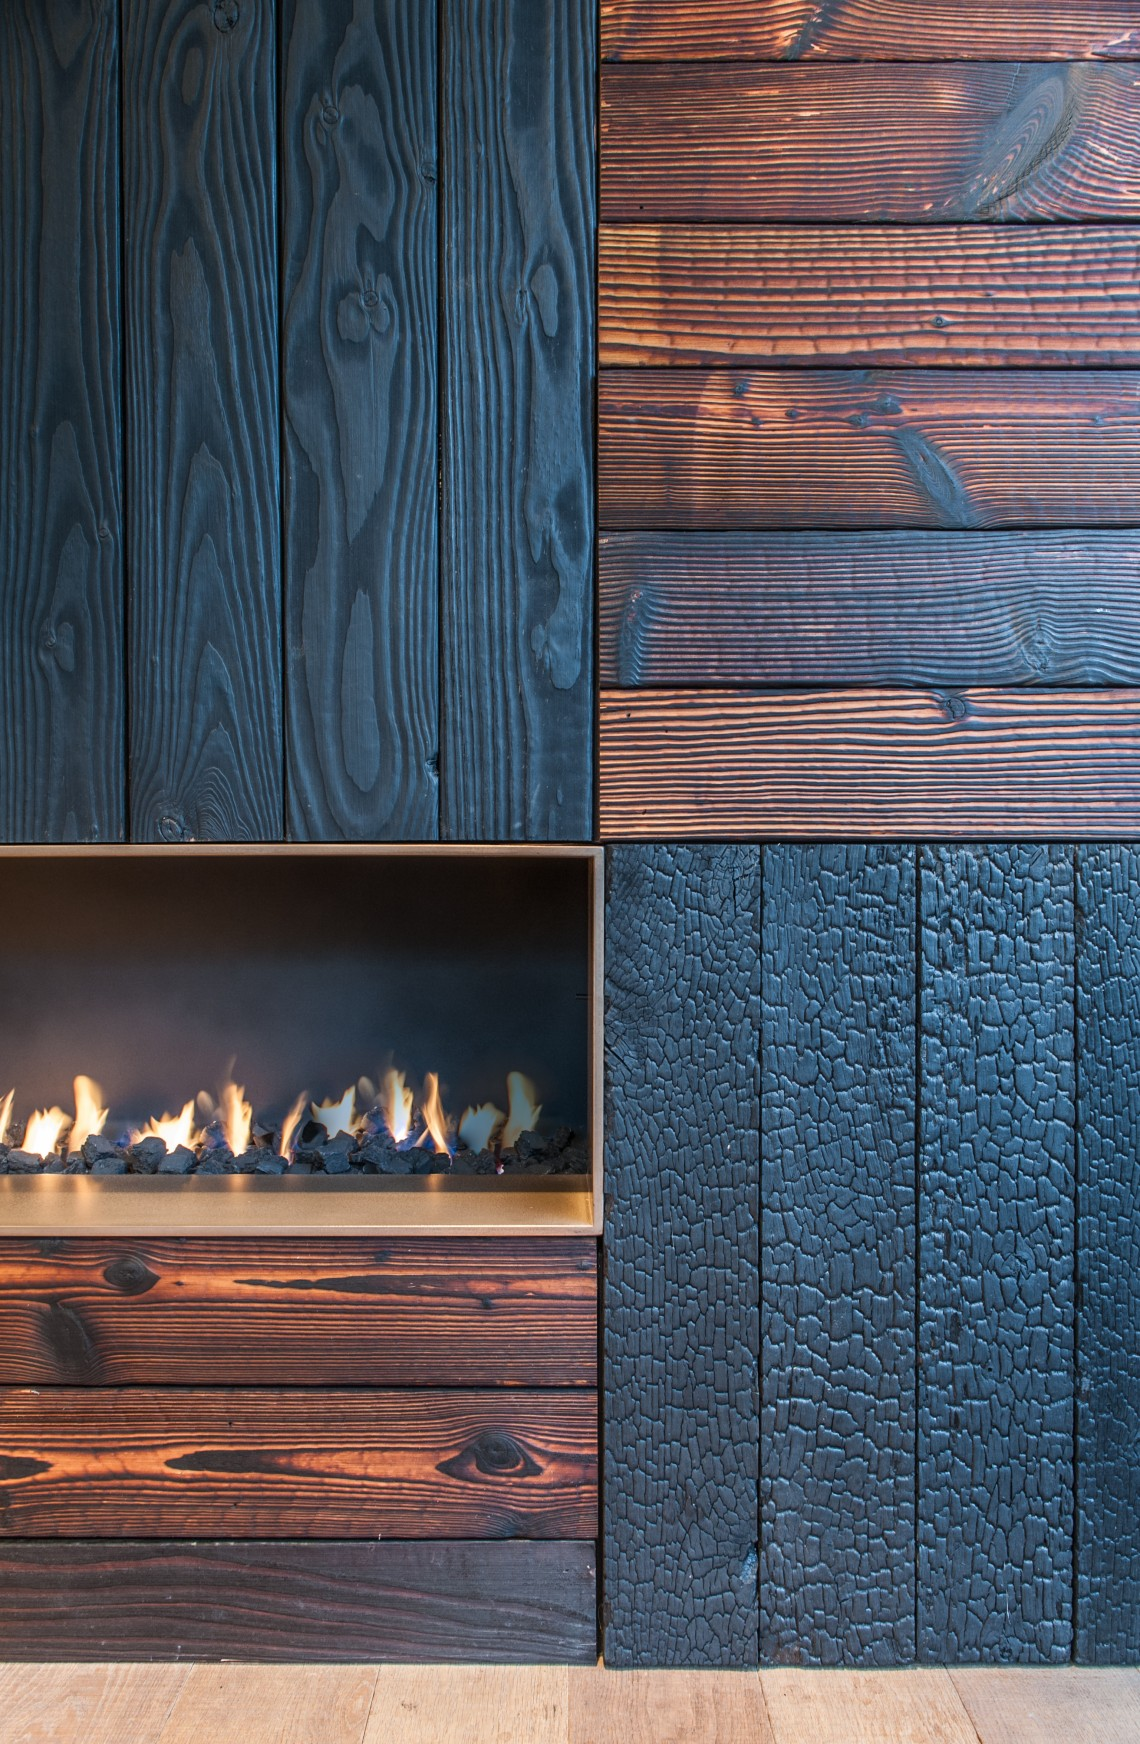 zwarthout shou sugi ban showroom openhaarden. Black Bedroom Furniture Sets. Home Design Ideas